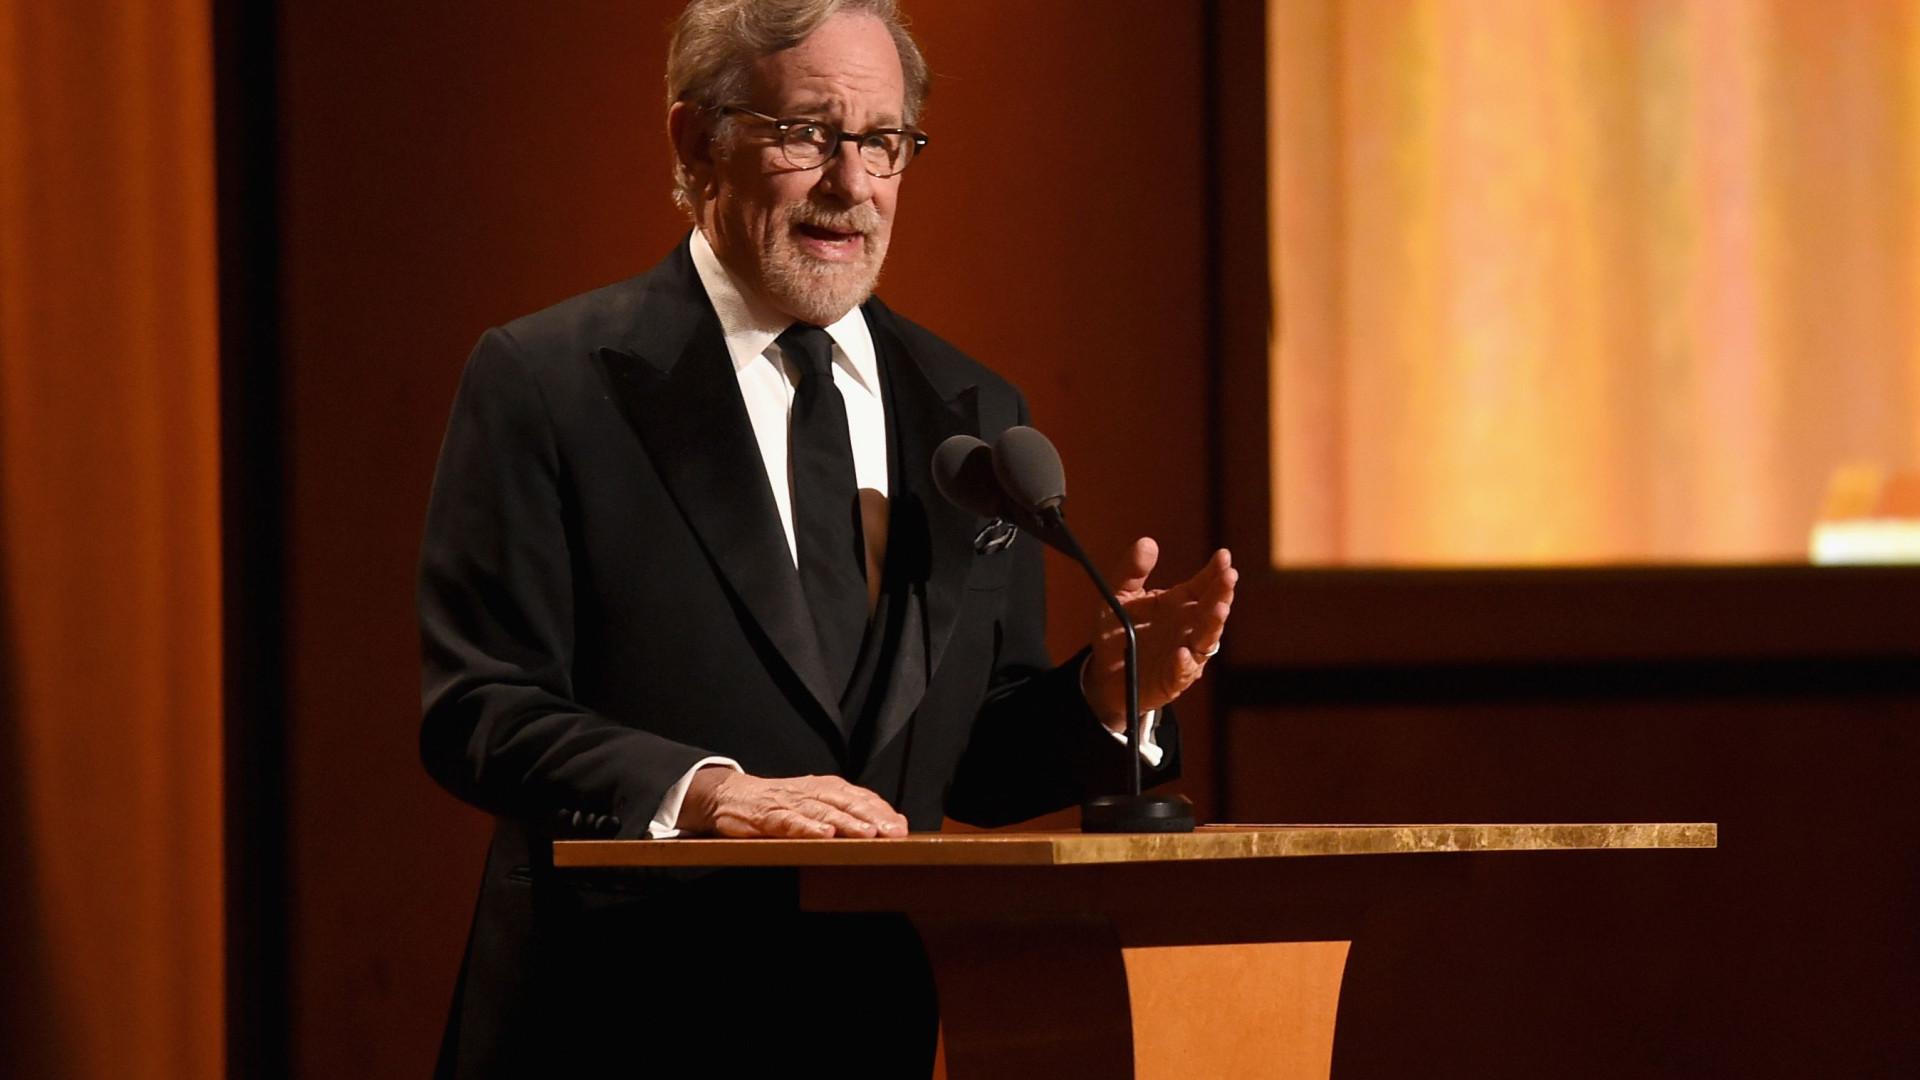 'A Lista de Schindler' faz 25 anos e Spielberg alerta para crescente ódio